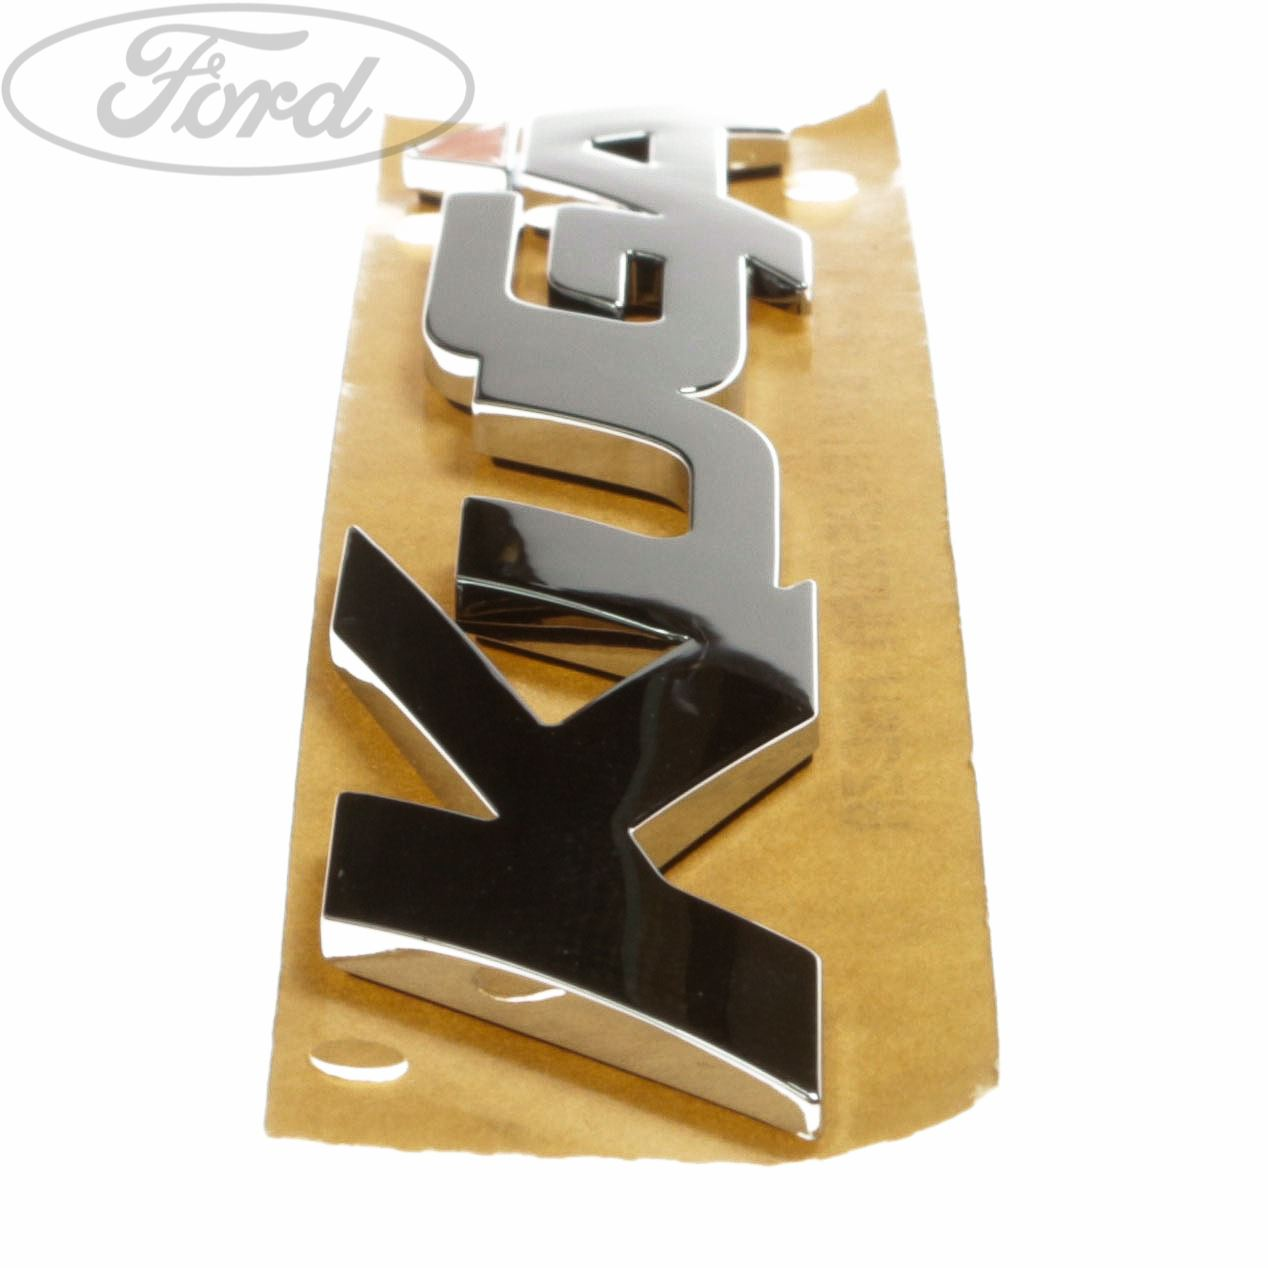 Genuine Ford Kuga MK1 Kuga Tailgate Name Plate Badge Emblem 1533047